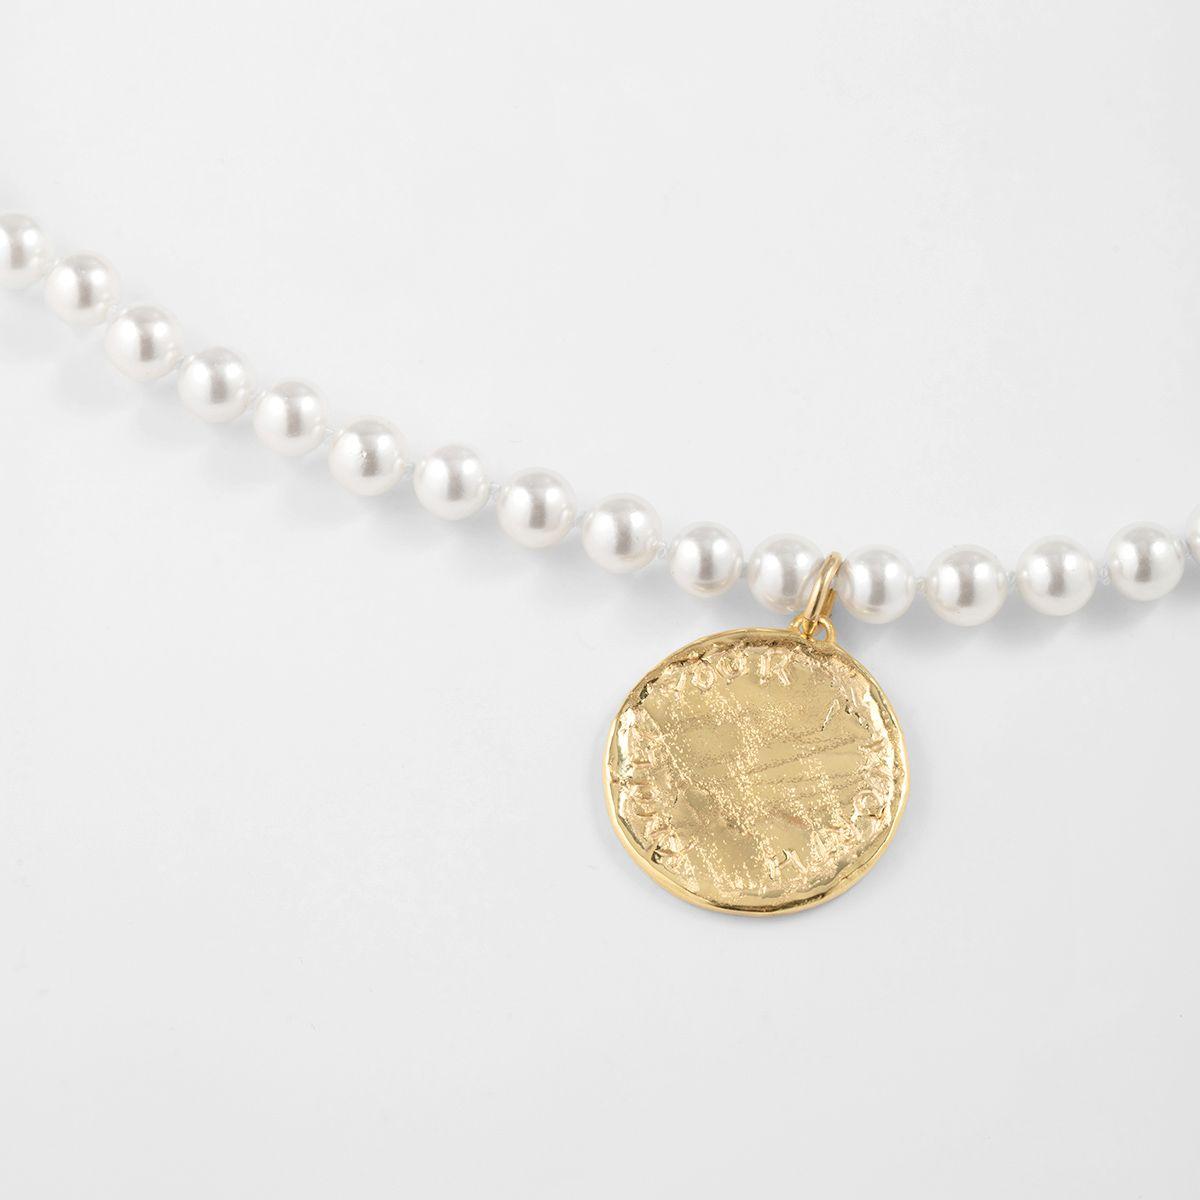 Chiara - Halsketten - 18k vergoldet